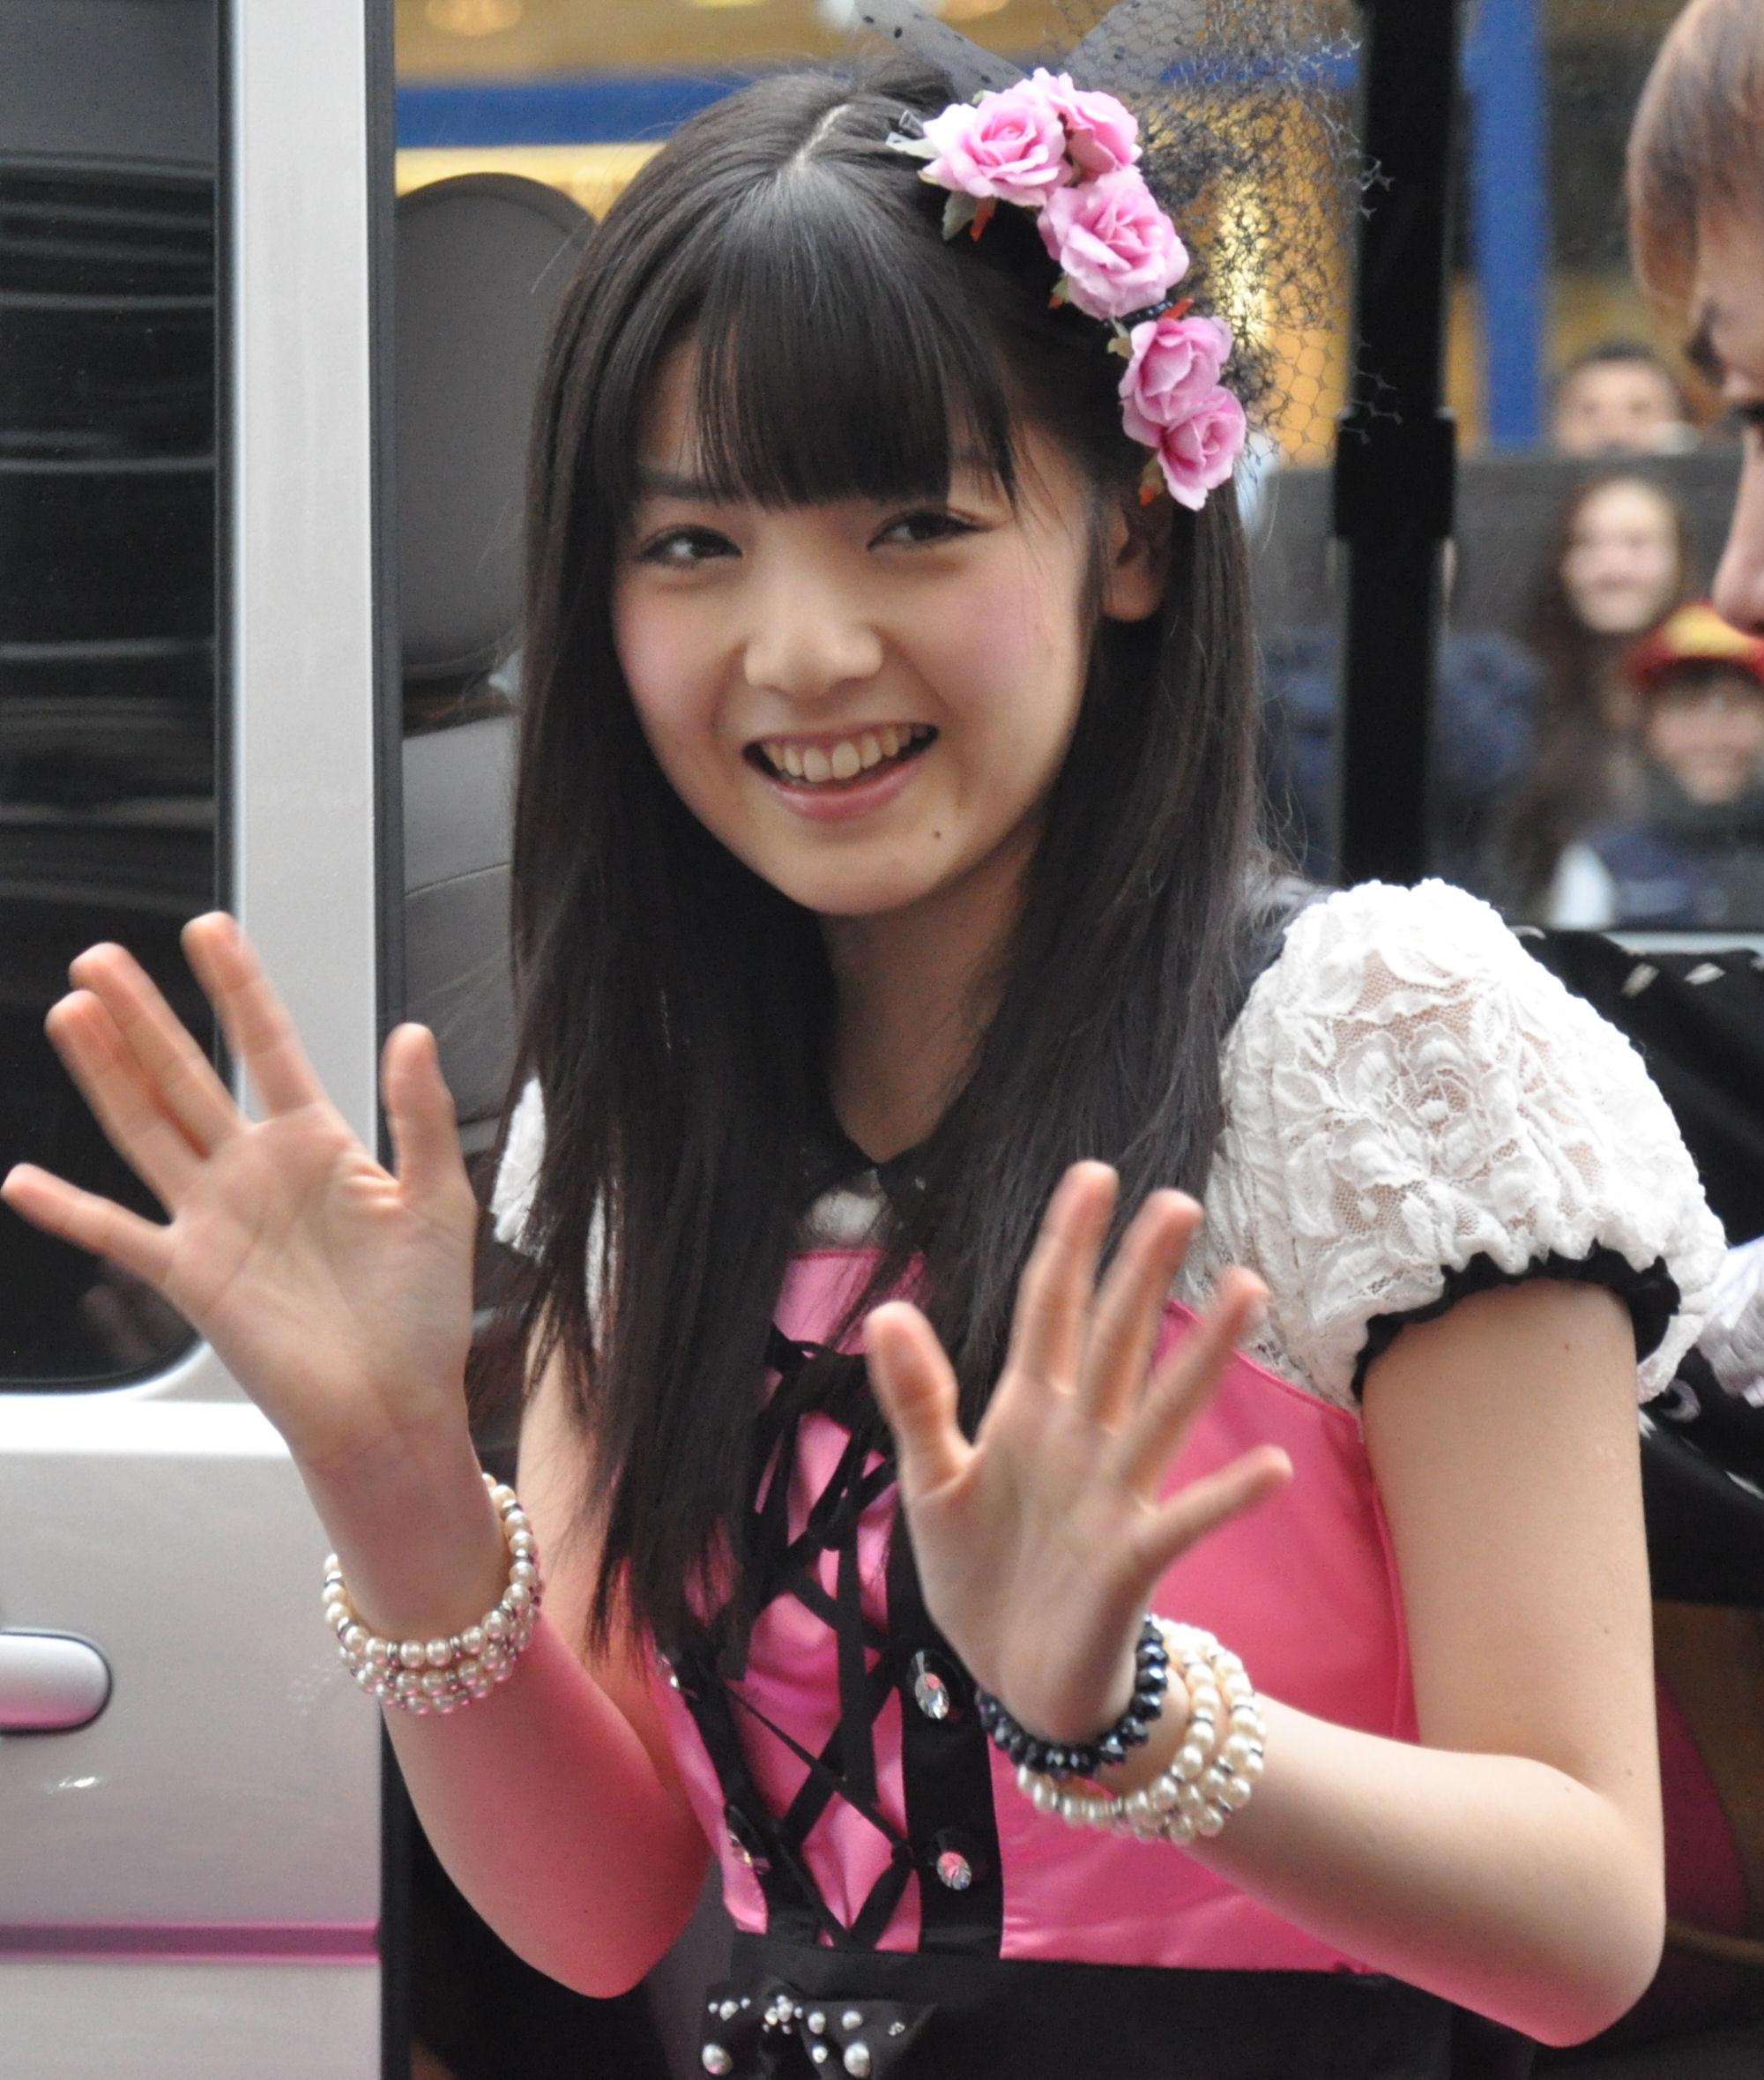 Is japanese necessary to H!P fans? (Momusu Paris Handshake Report)